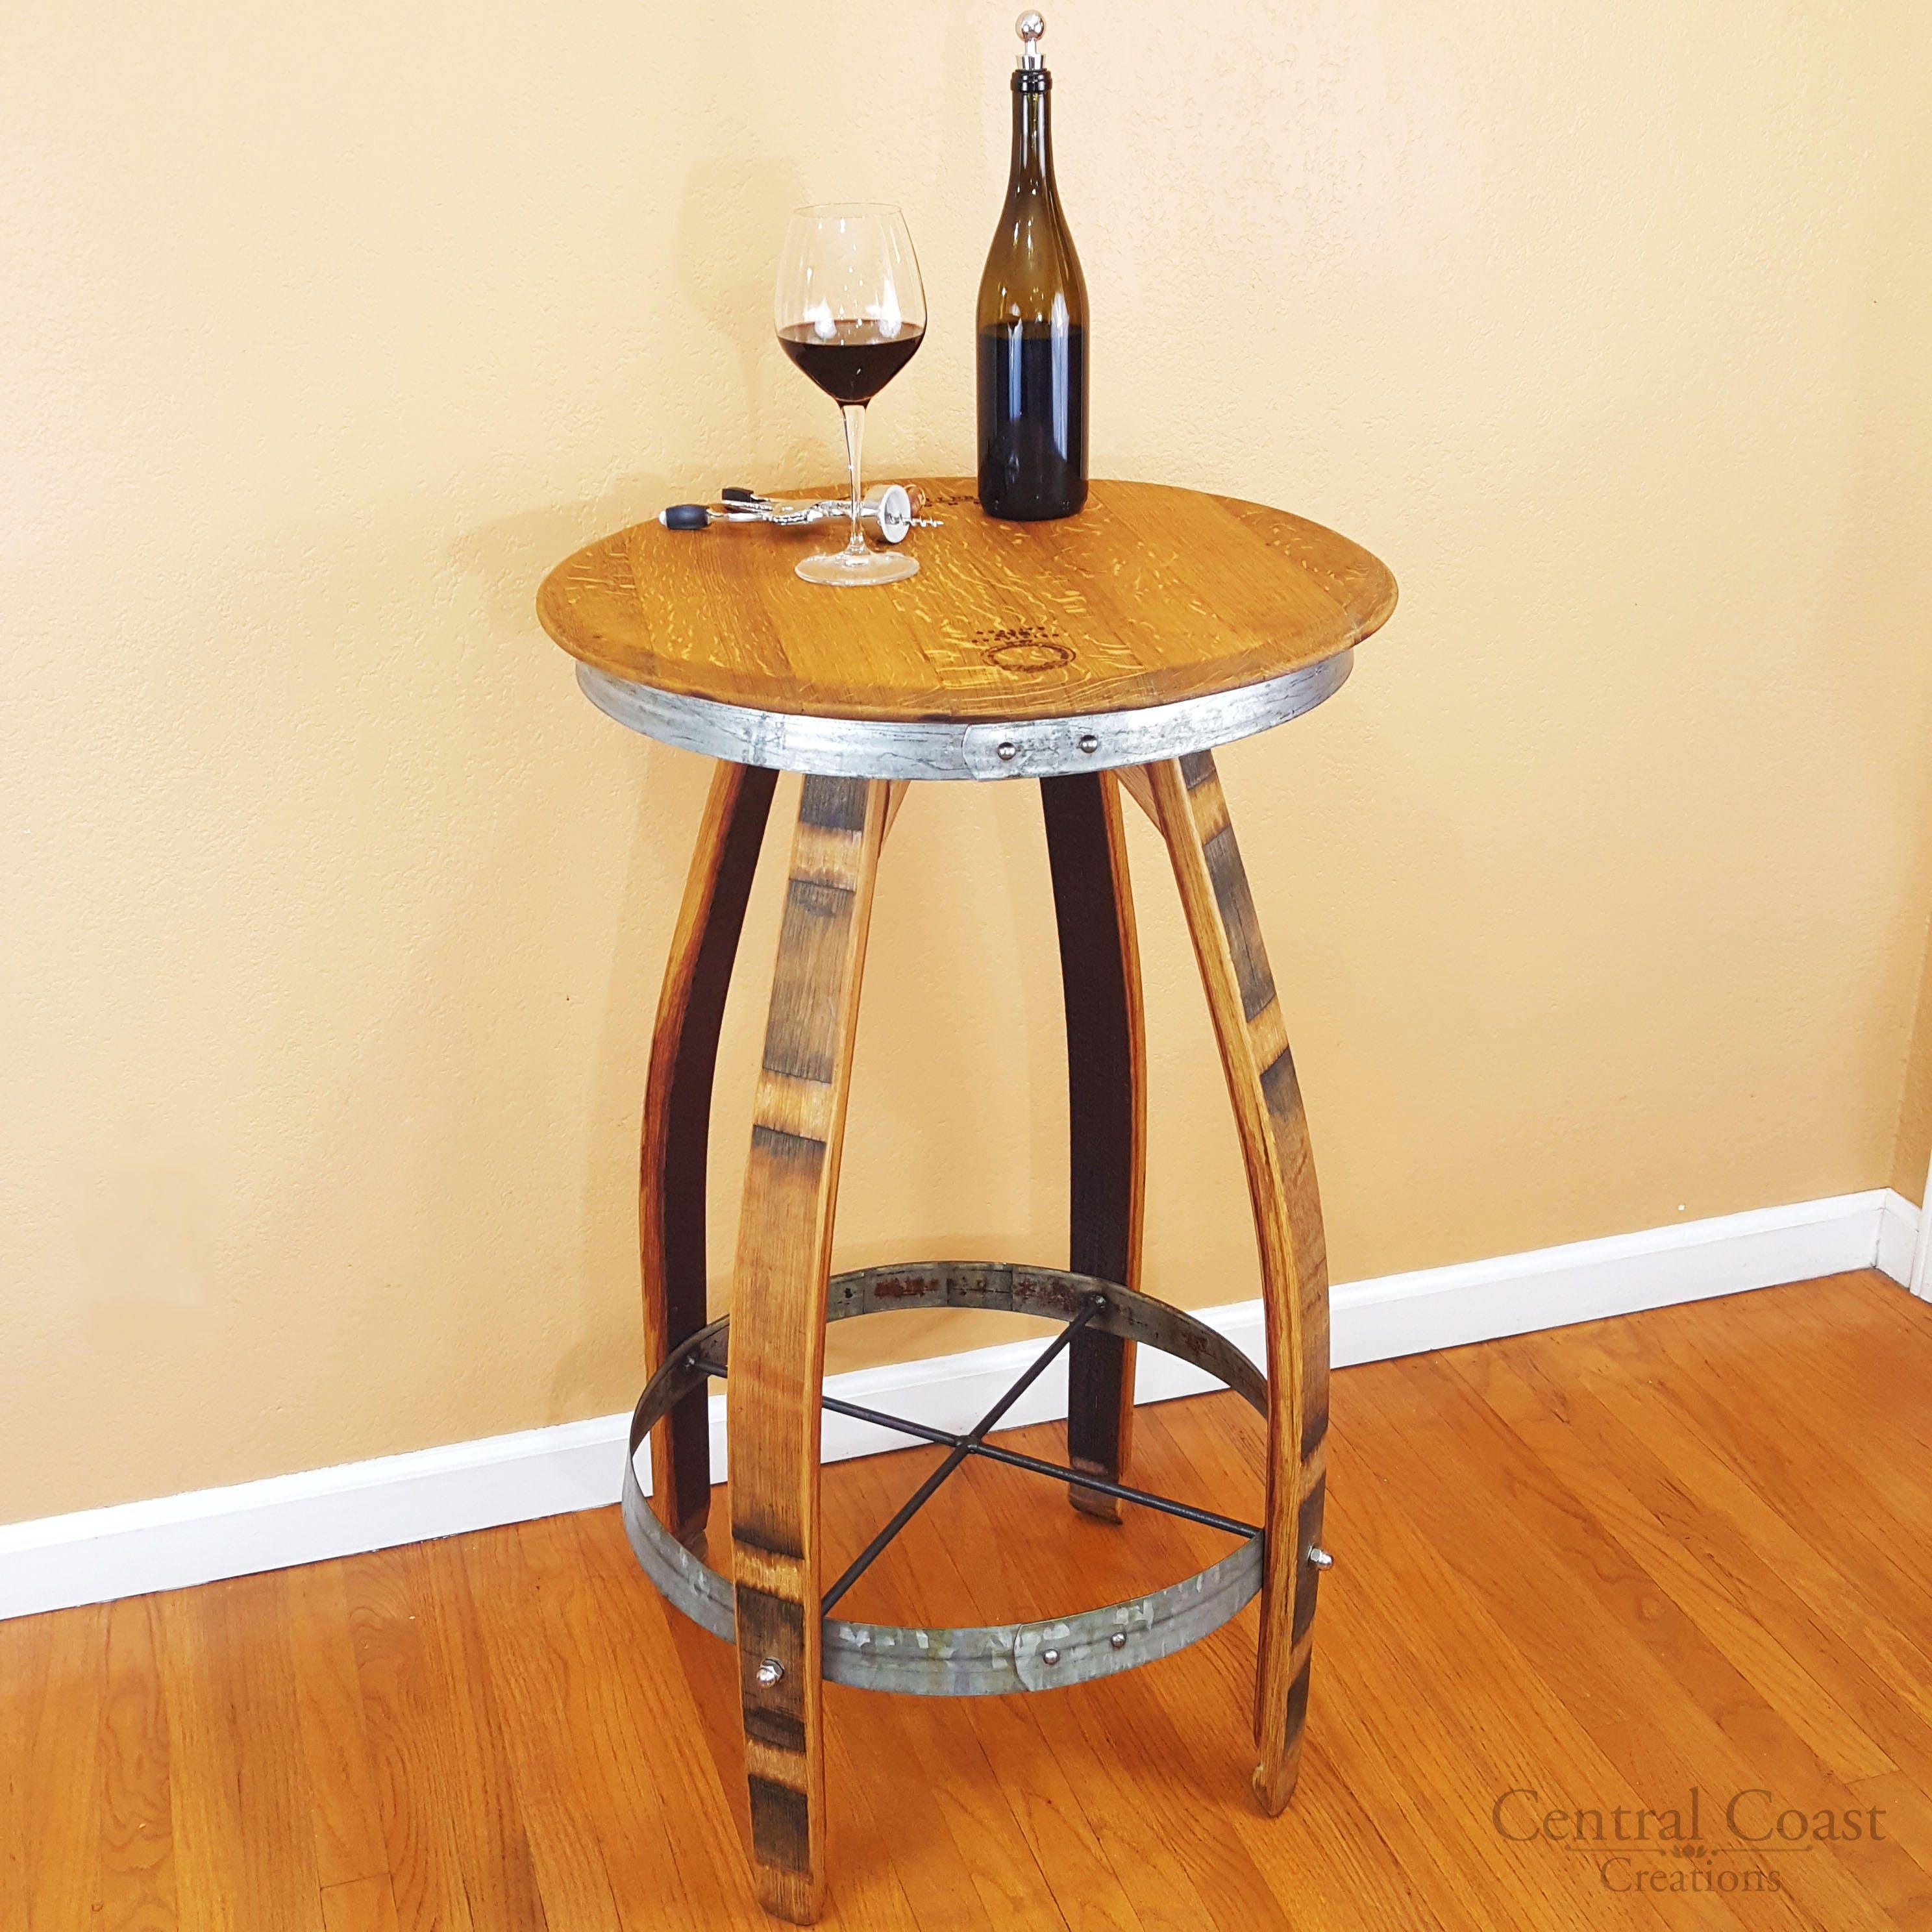 Wine Barrel Pub Table Rustic Furniture Home Decor Patio   Etsy